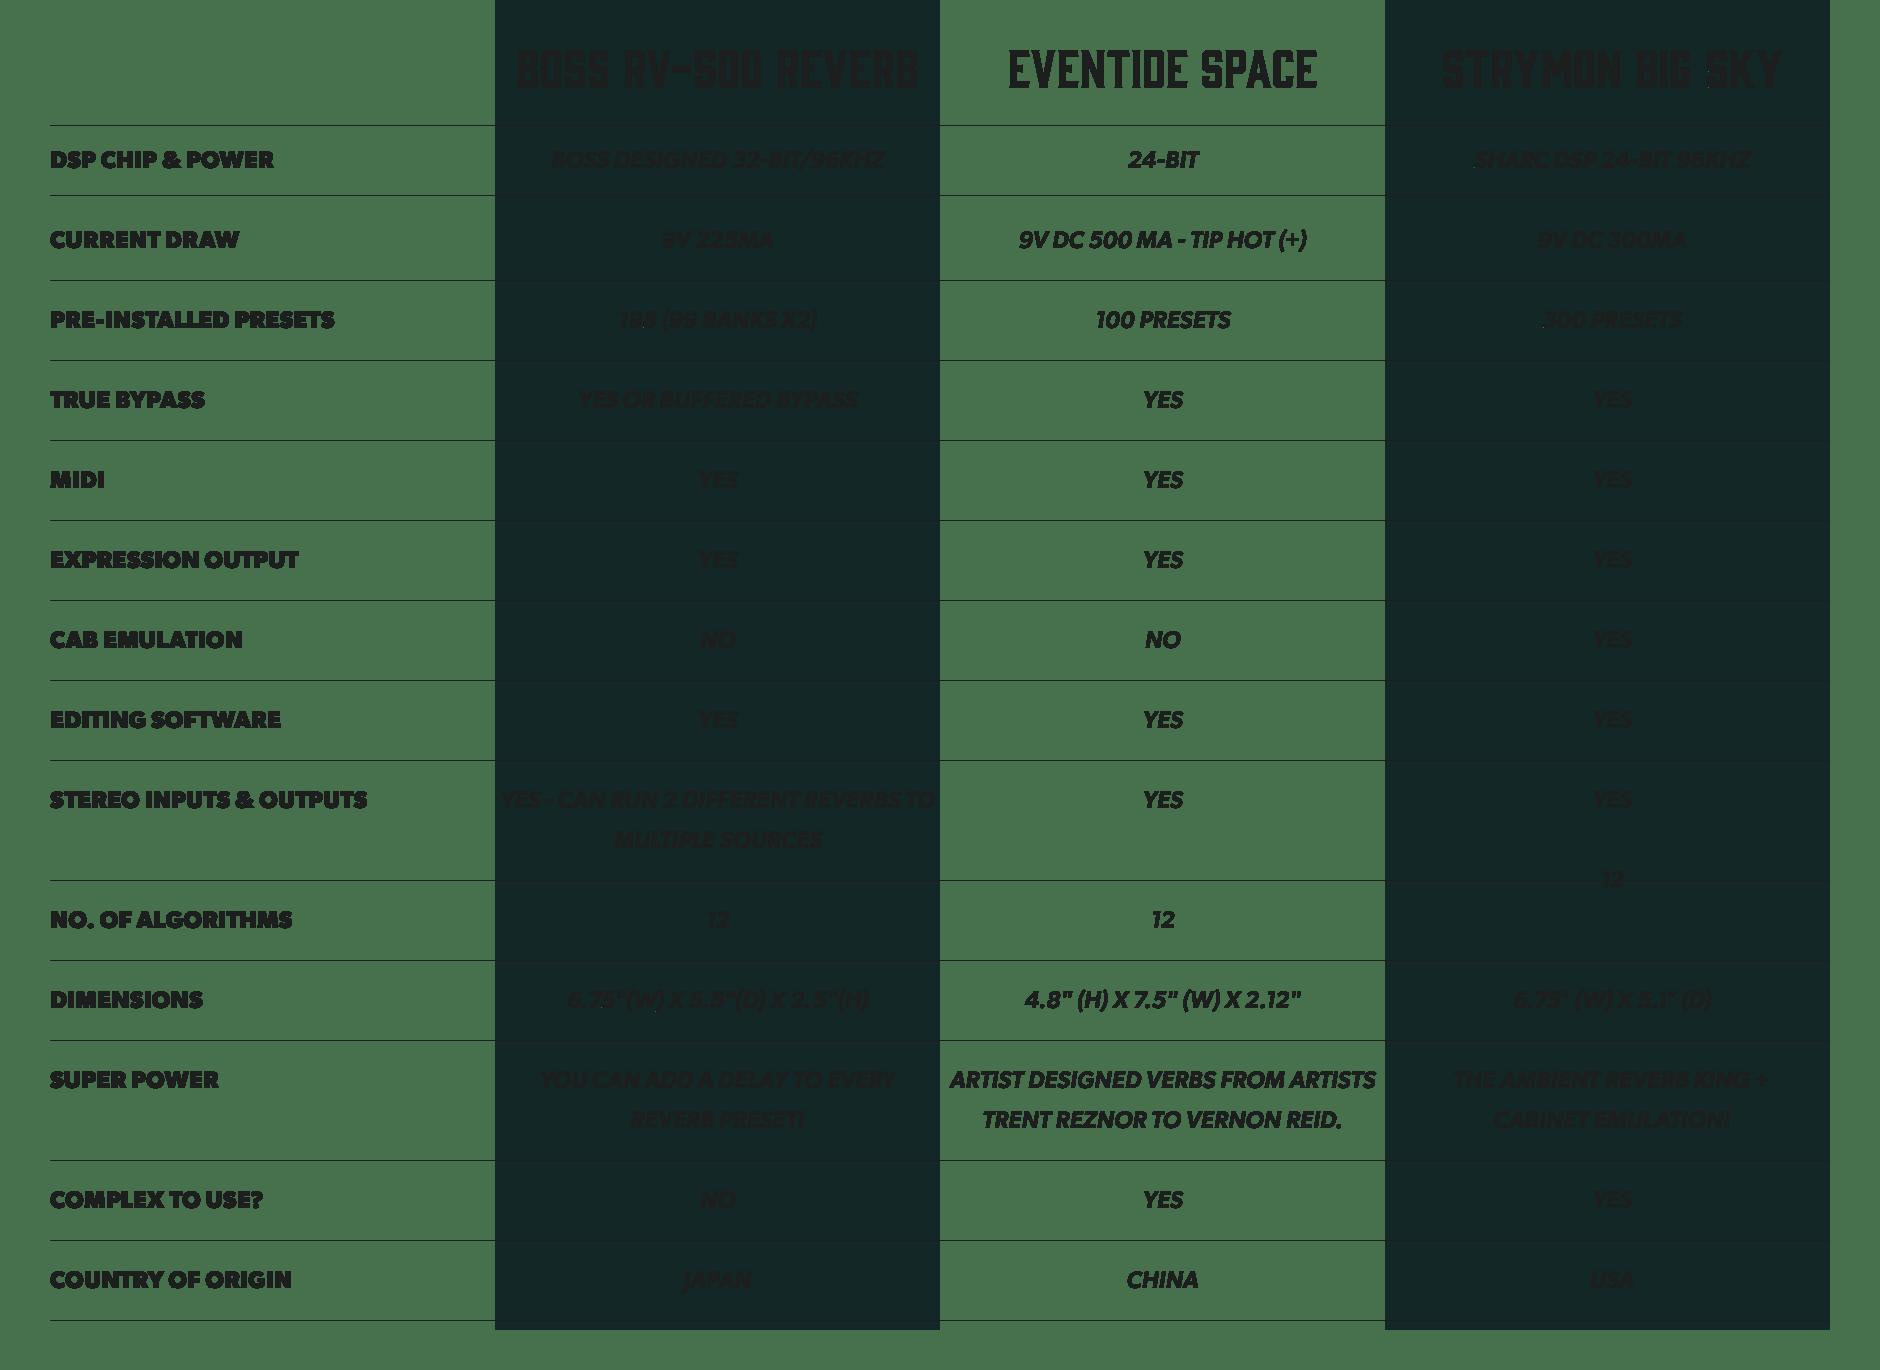 Boss Vs Strymon Eventide Pedal Comparison Andertons Blog Circuits Gt Dd 2 Digital Delay Guitar Schematic Diagram Rv 500 Reverb Space Big Sky